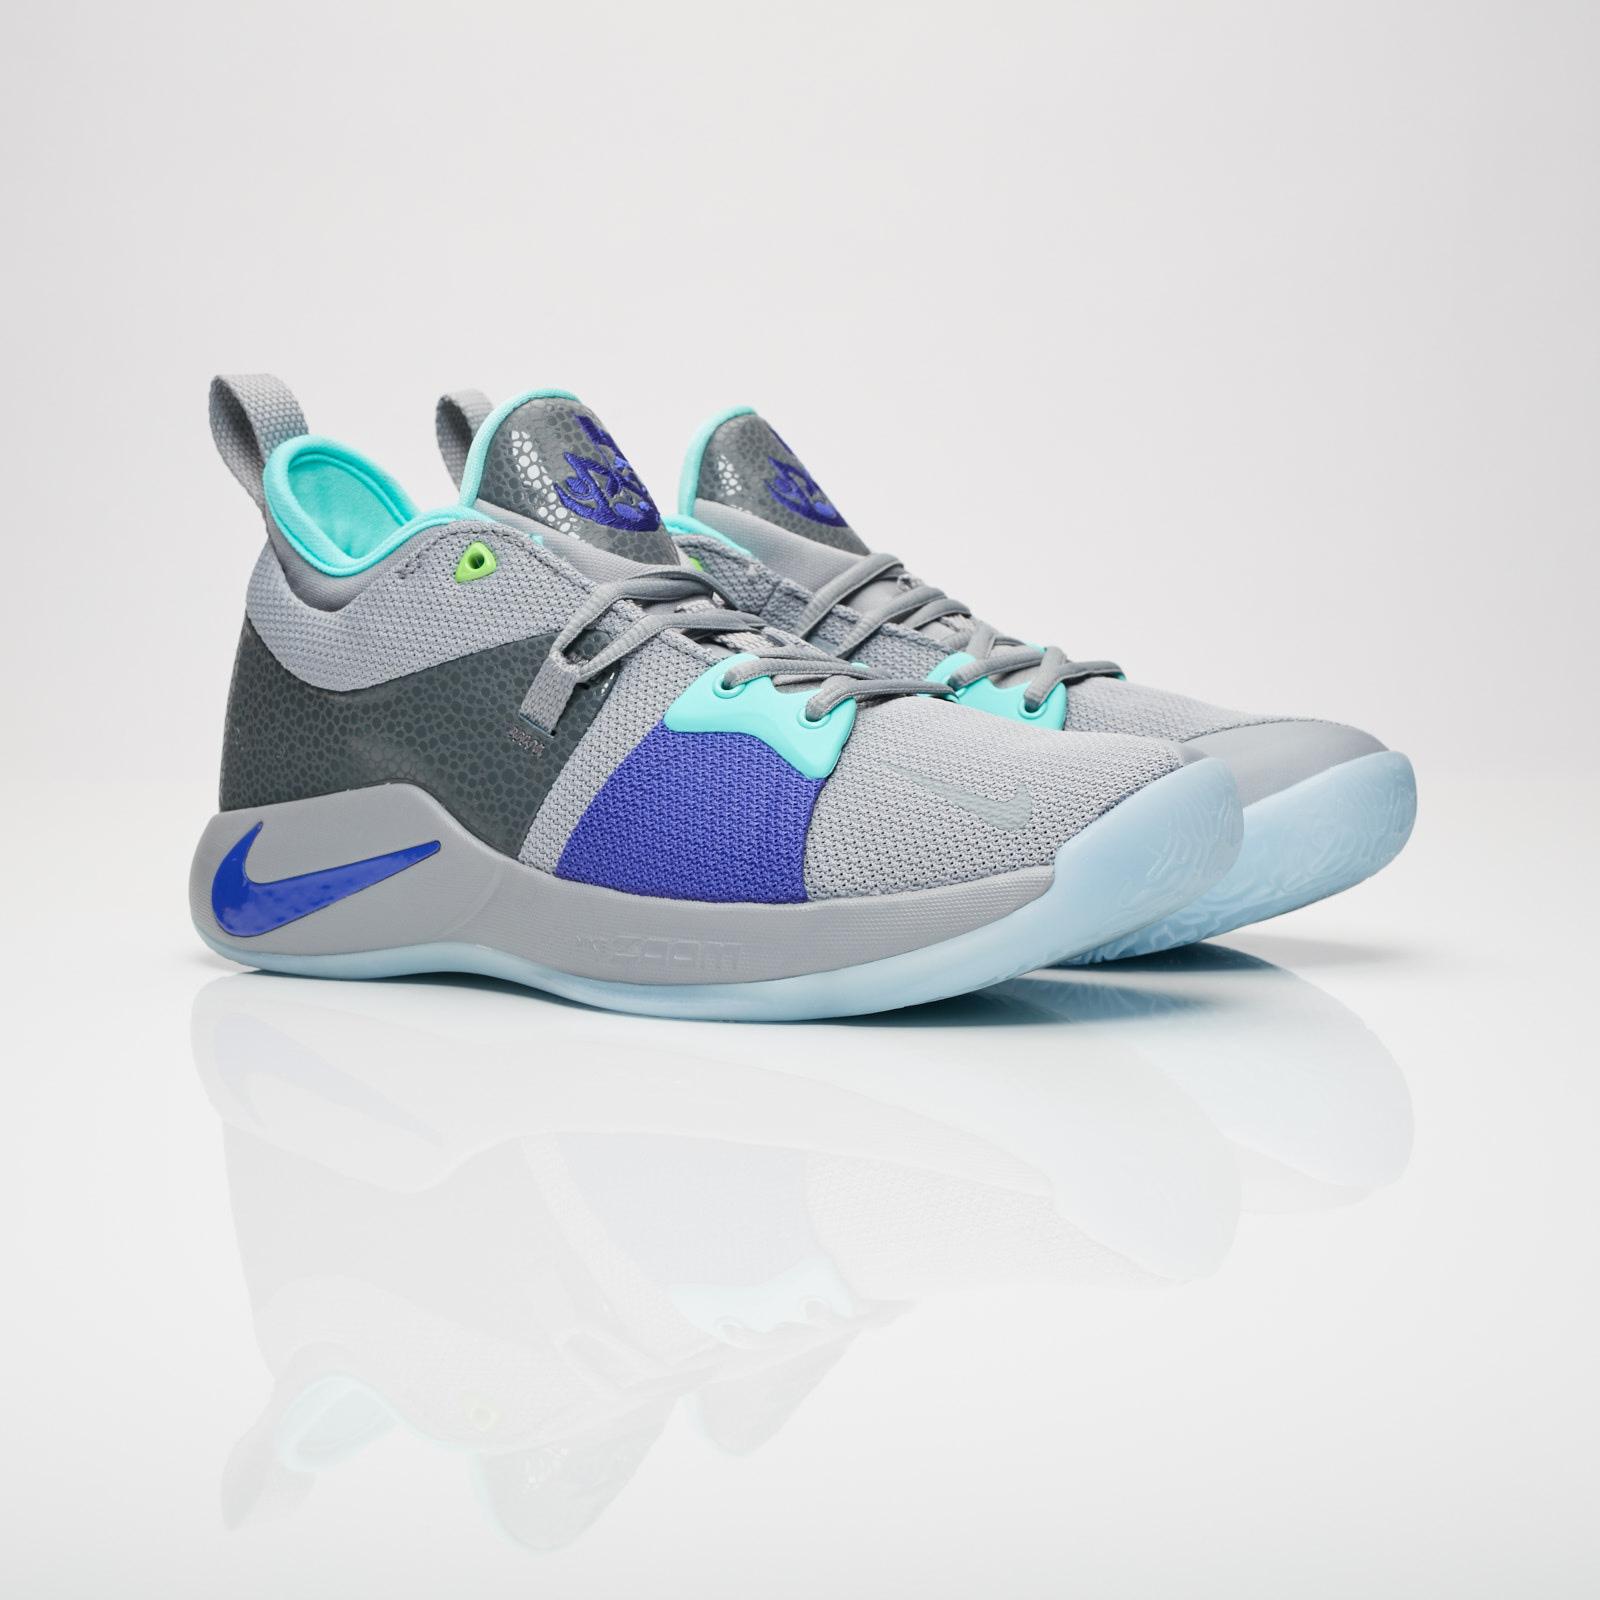 half off 7c145 43d42 Nike Basketball PG 2